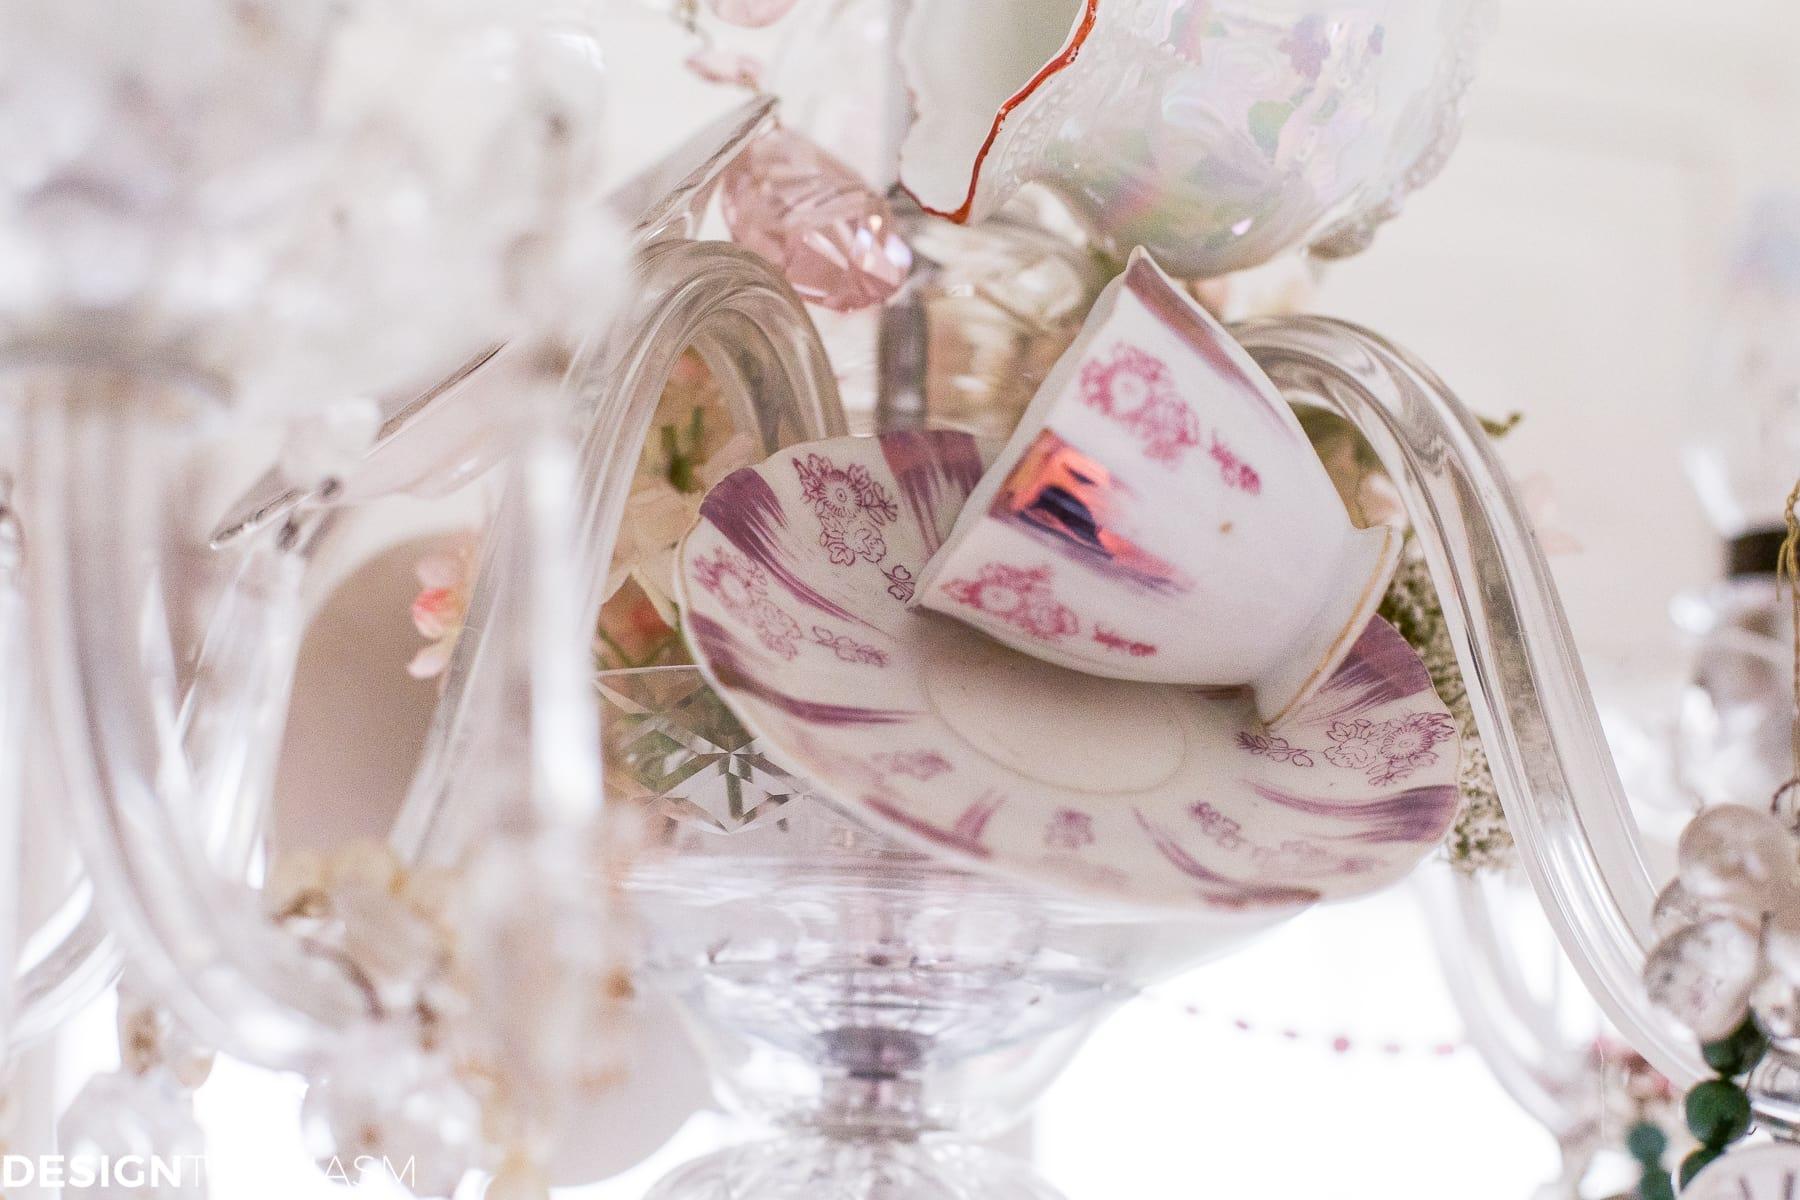 Teacup chandelier   How to personalize your vintage chandelier - designthusiasm.com